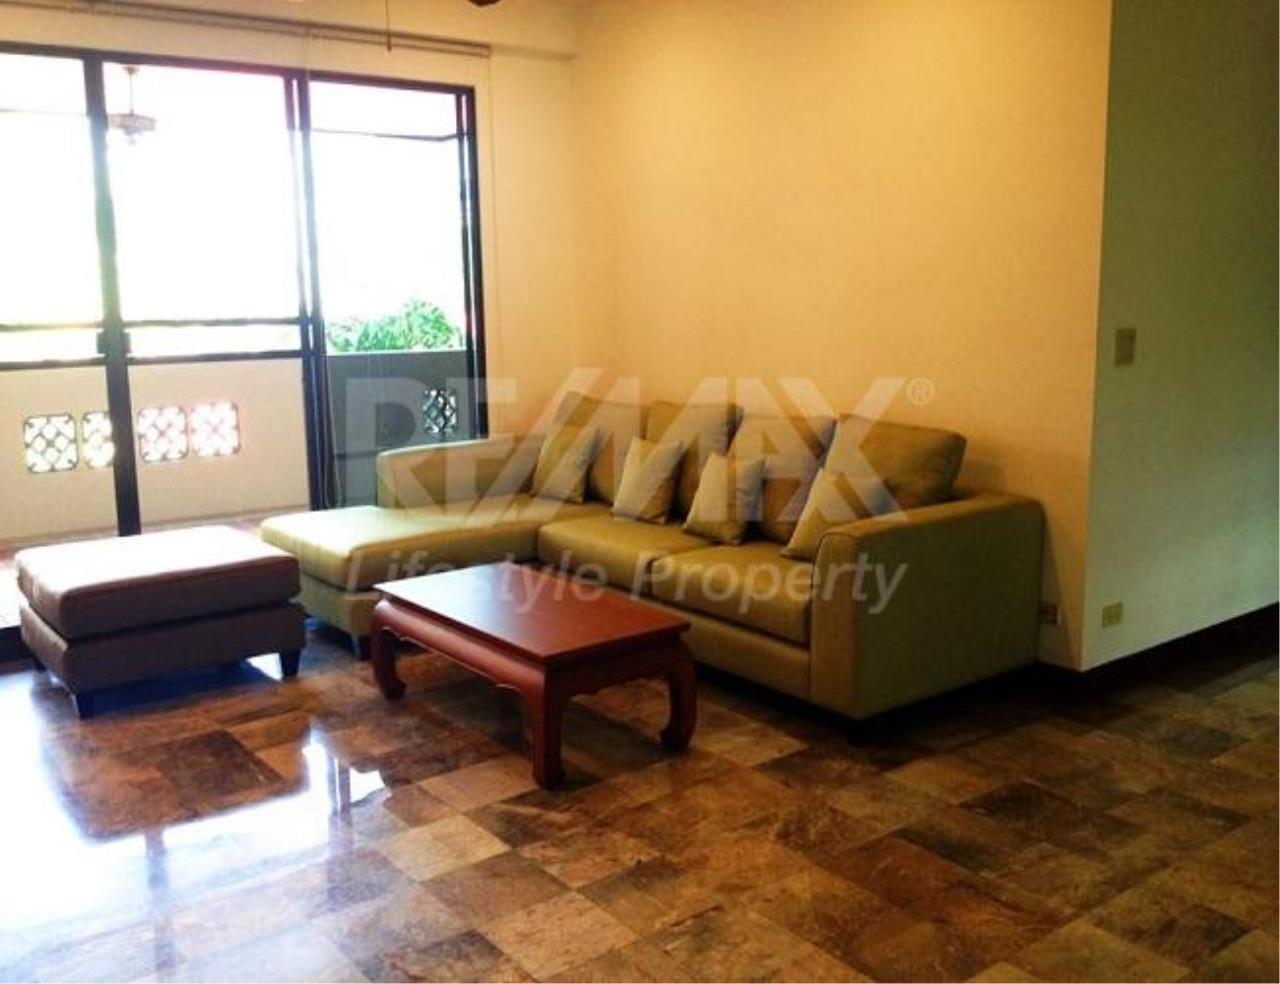 RE/MAX LifeStyle Property Agency's Raintree Village Apartment 11